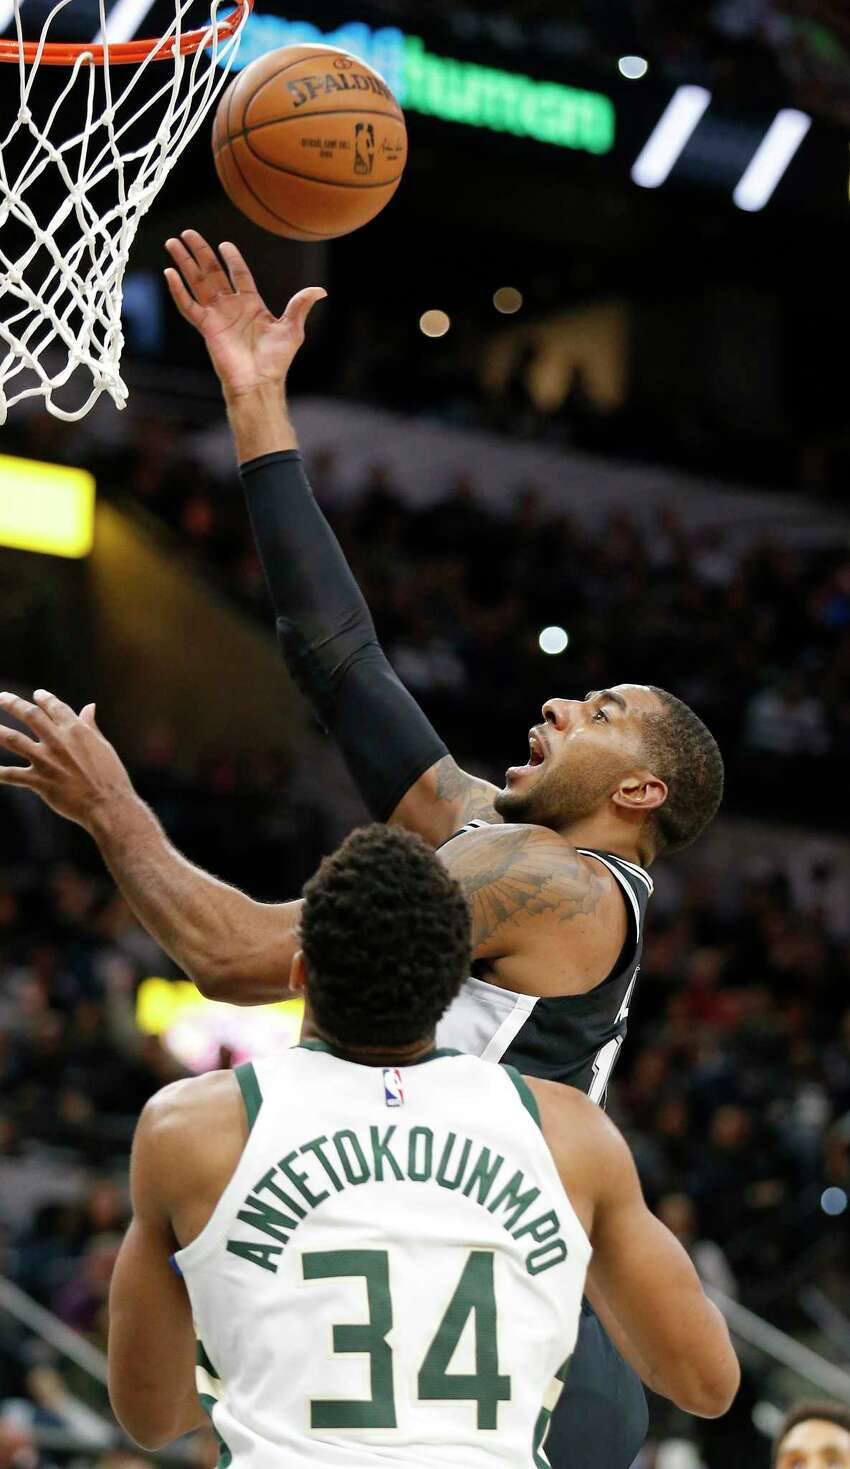 San Antonio Spurs' LaMarcus Aldridge shoots around Milwaukee Bucks Giannis Antetokounmpo during first half action Friday Nov. 10, 2017 at the AT&T Center.